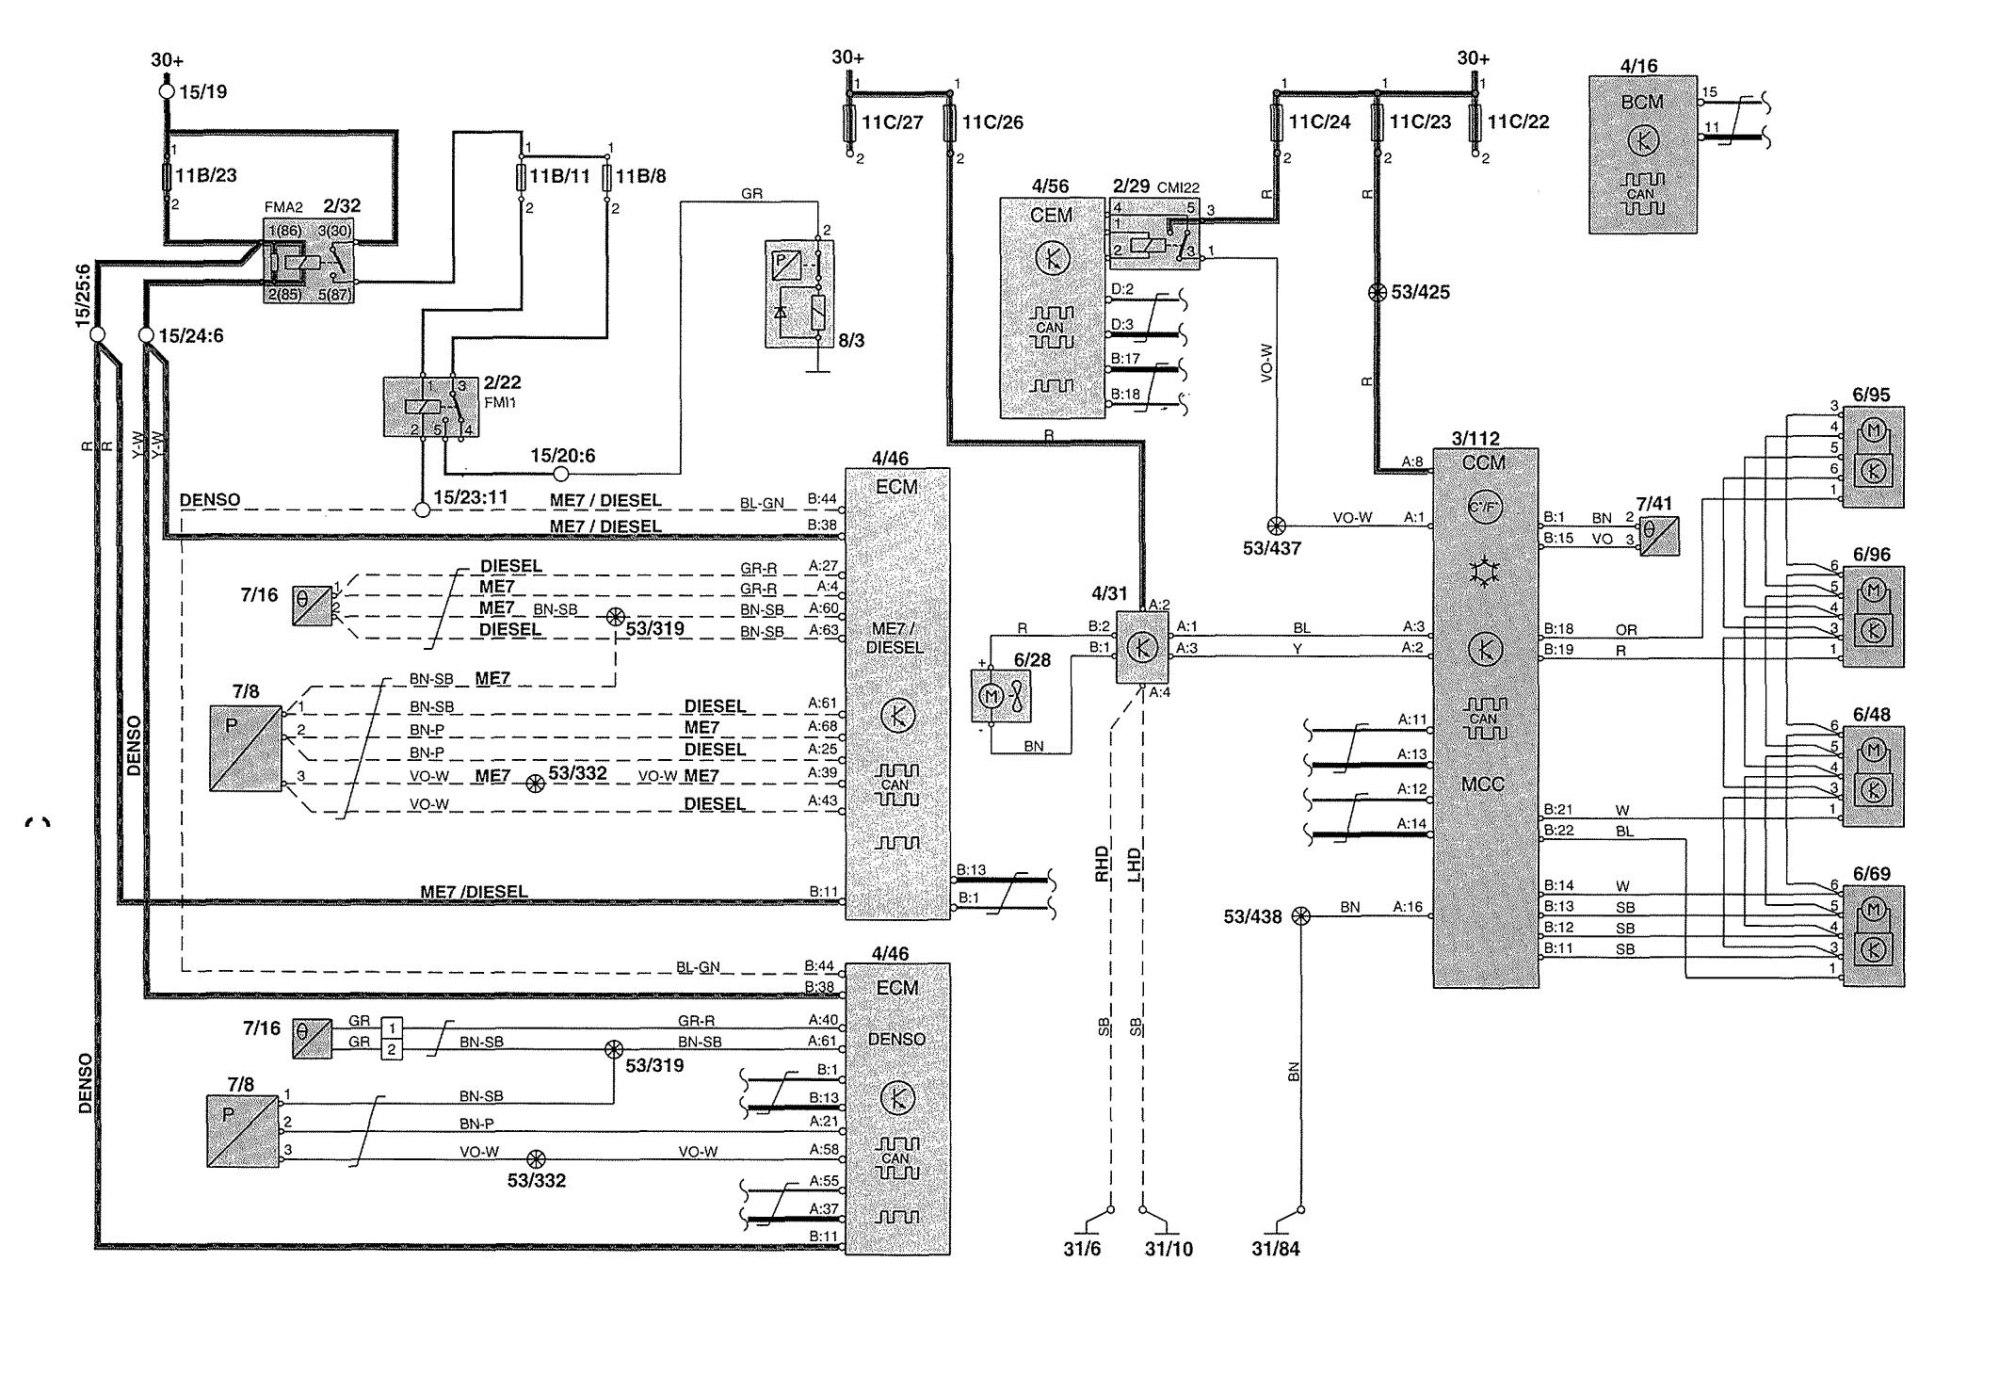 hight resolution of volvo v70 wiring diagram simple wiring schema rh 20 aspire atlantis de wiring diagram volvo v70 2005 wiring diagram volvo xc70 2004